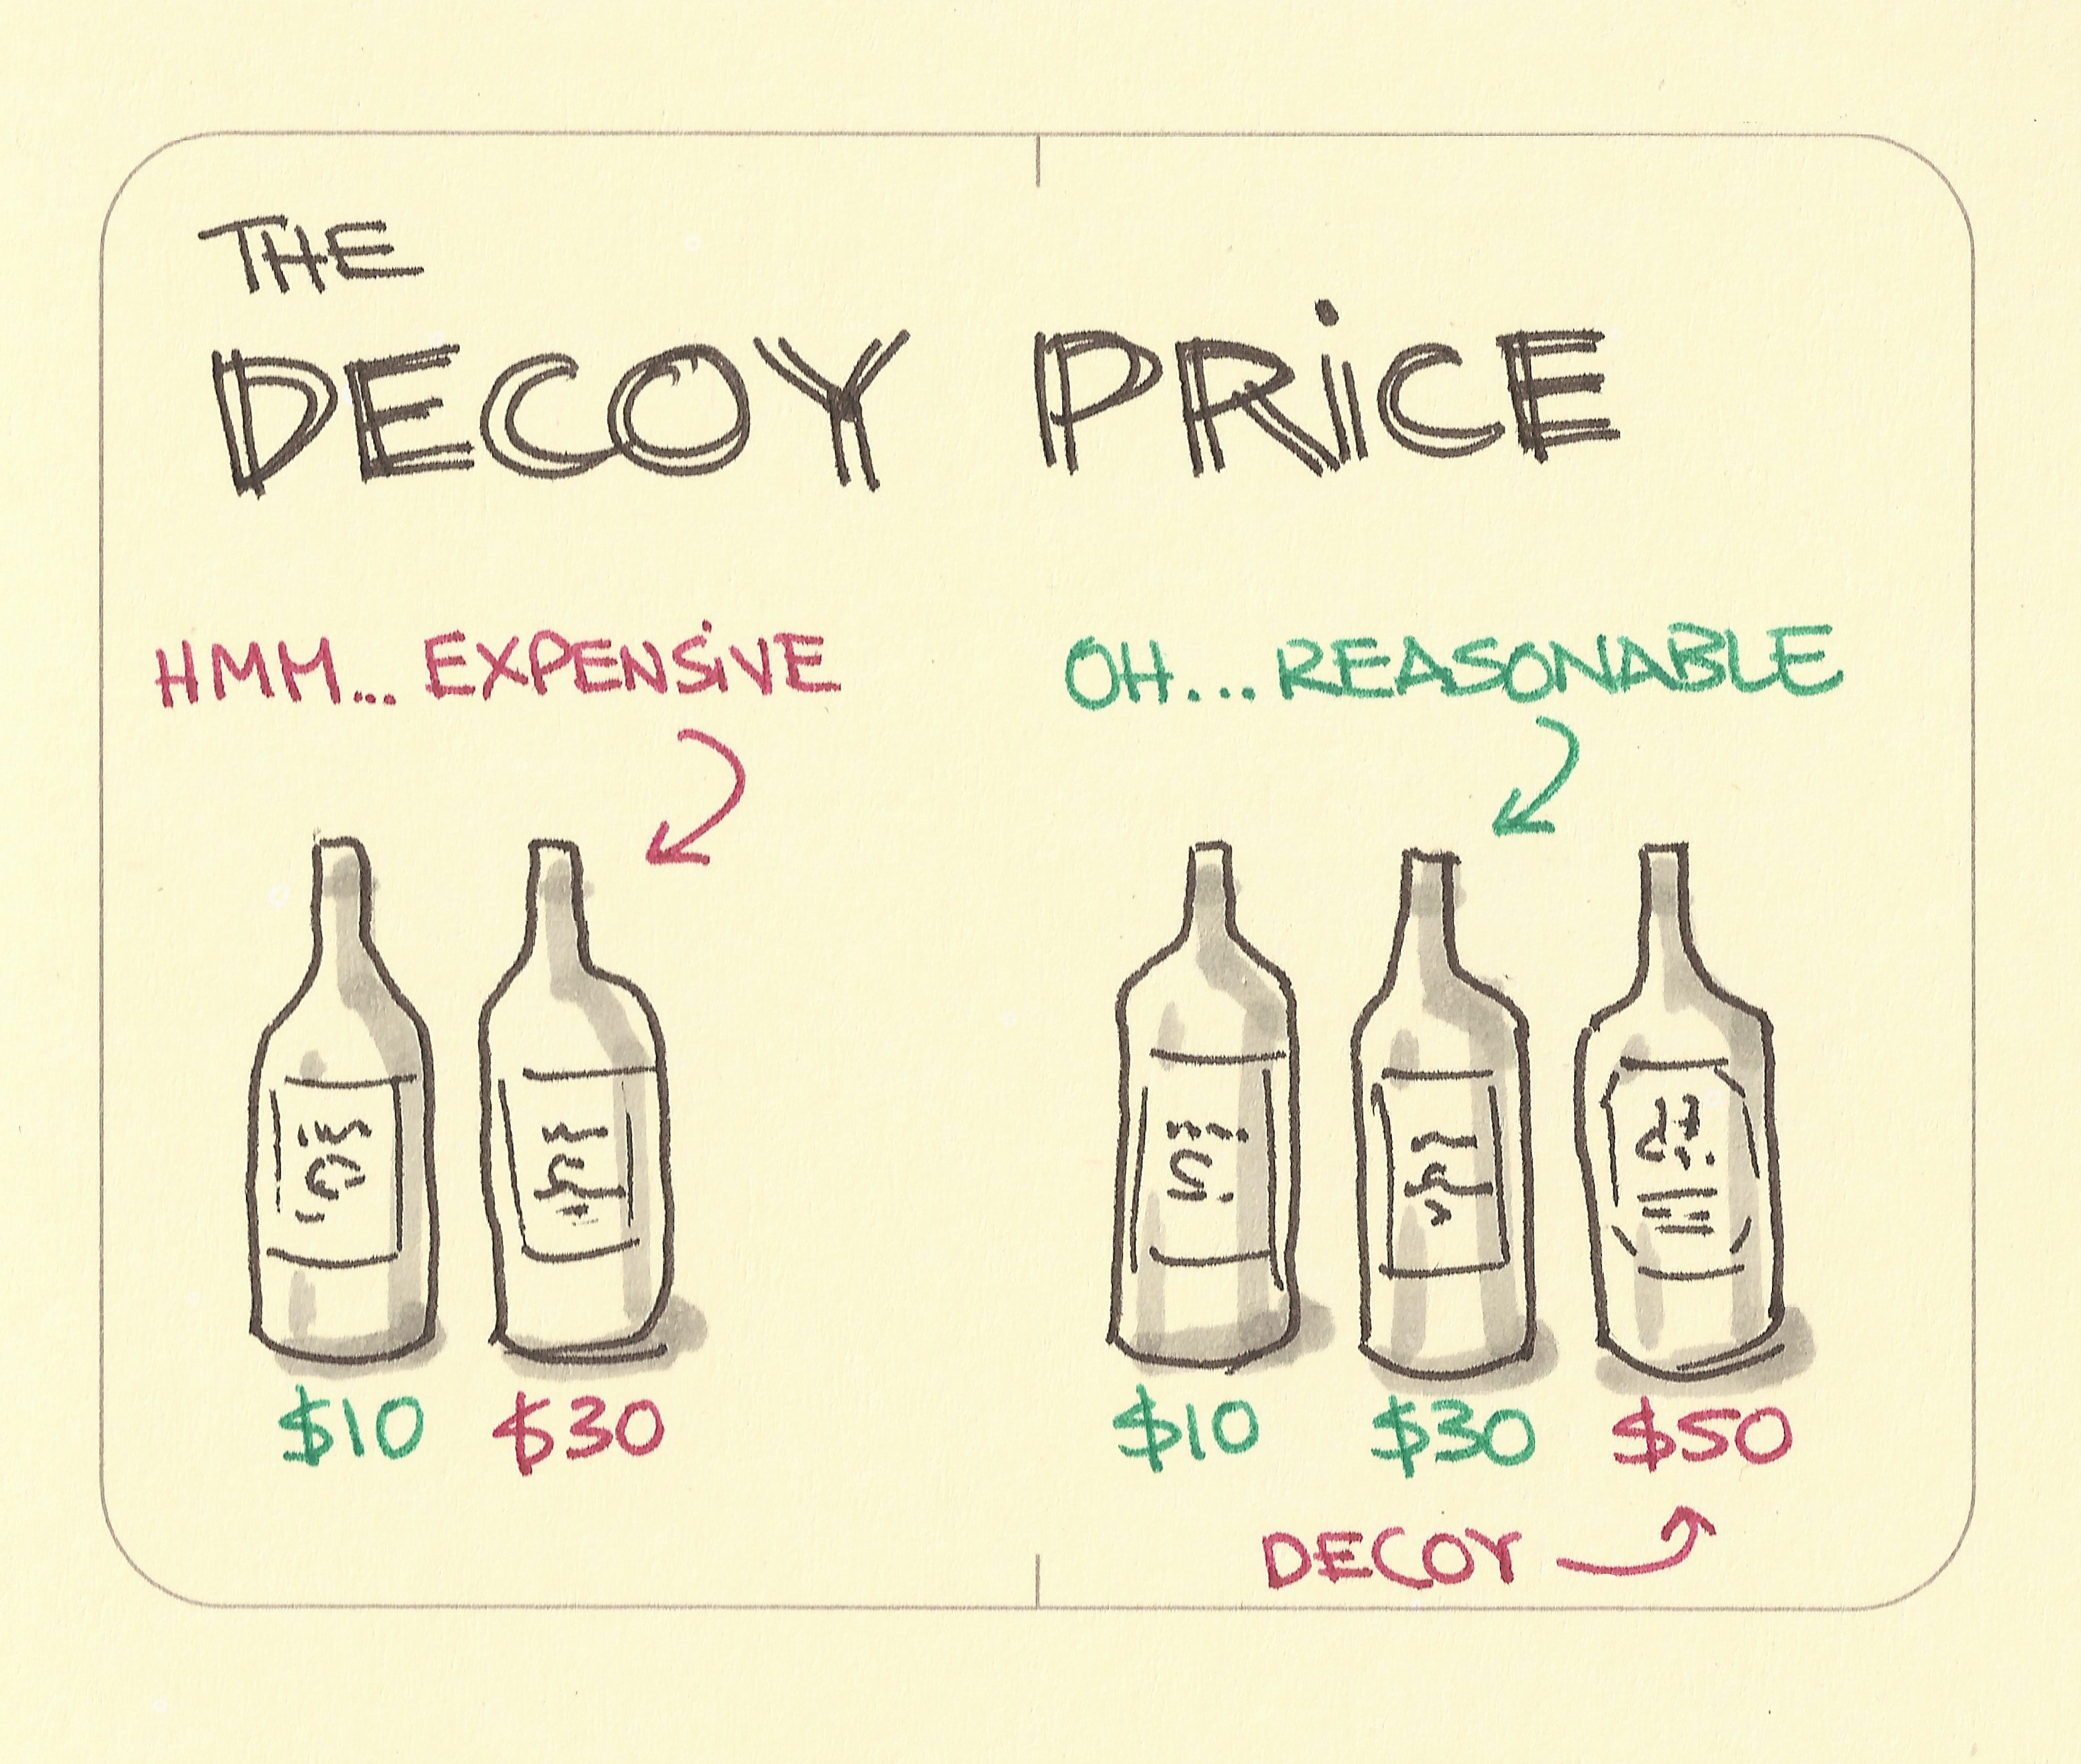 decoy effect image